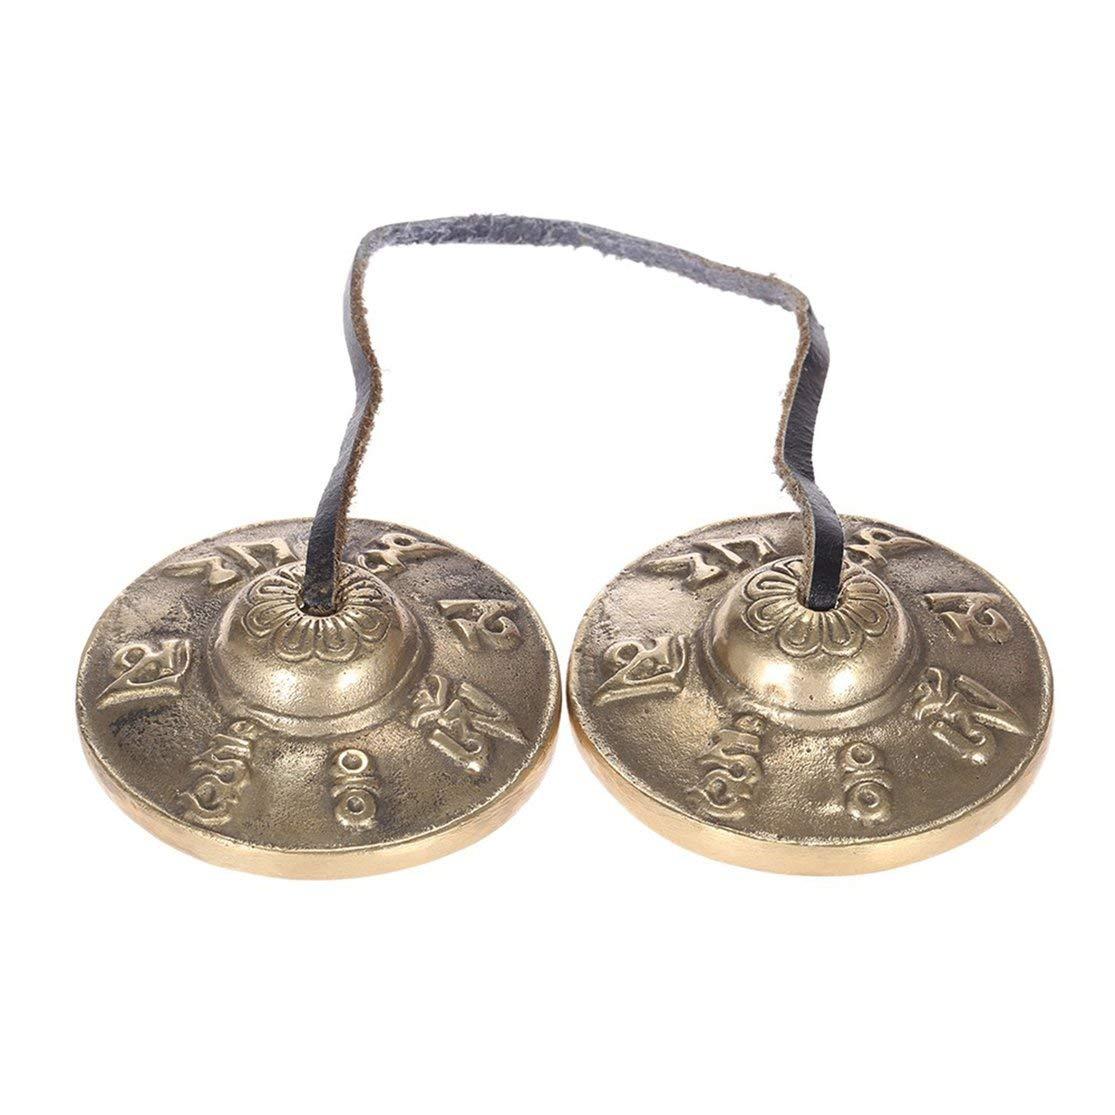 LouiseEvel215 Forfar Tingsha Campana tibetana Meditaci/ón Artesanal Platillo Campana Cobre Sonido n/ítido Lucky Symbols Templo Budista